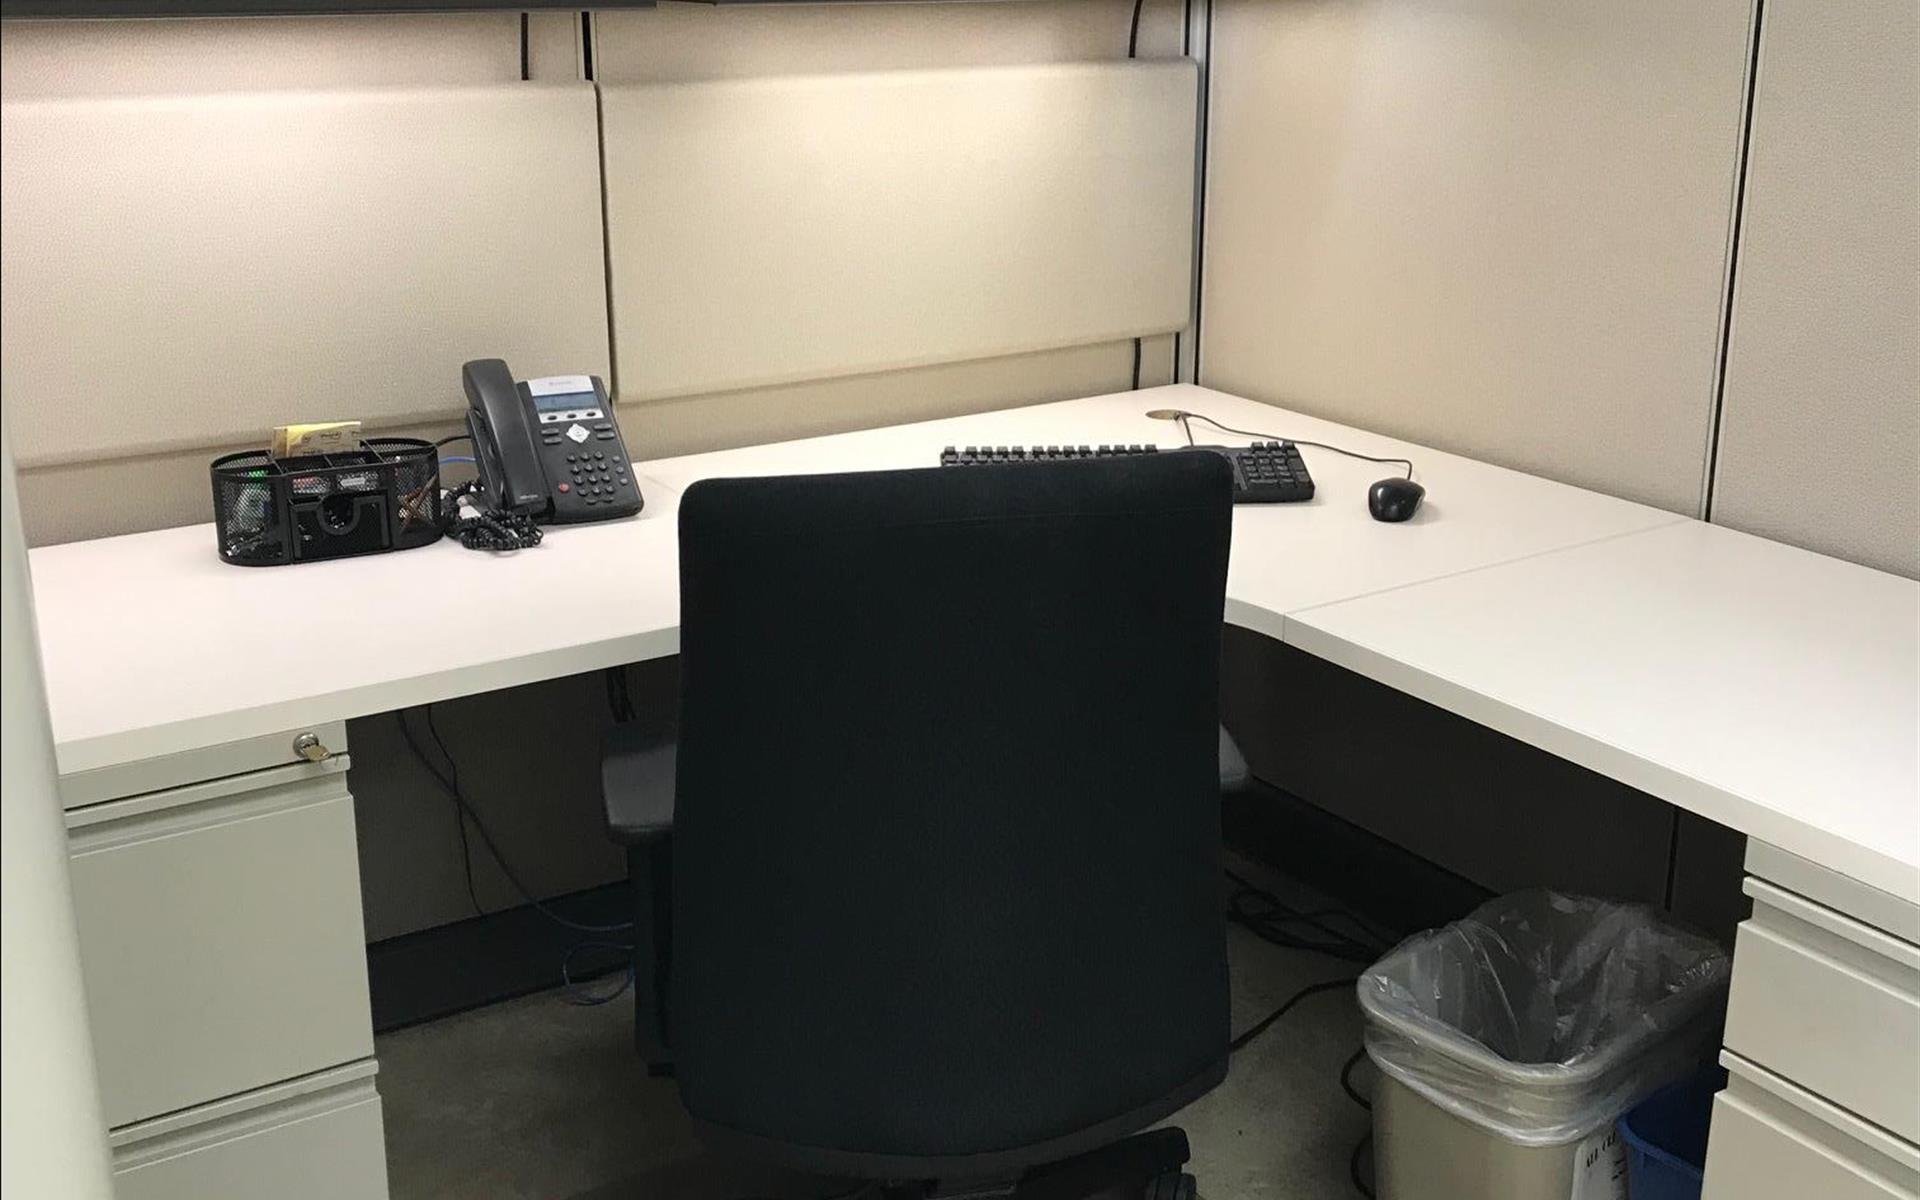 333 N. Michigan Avenue, Suite 2000 - Dedicated Desk 1